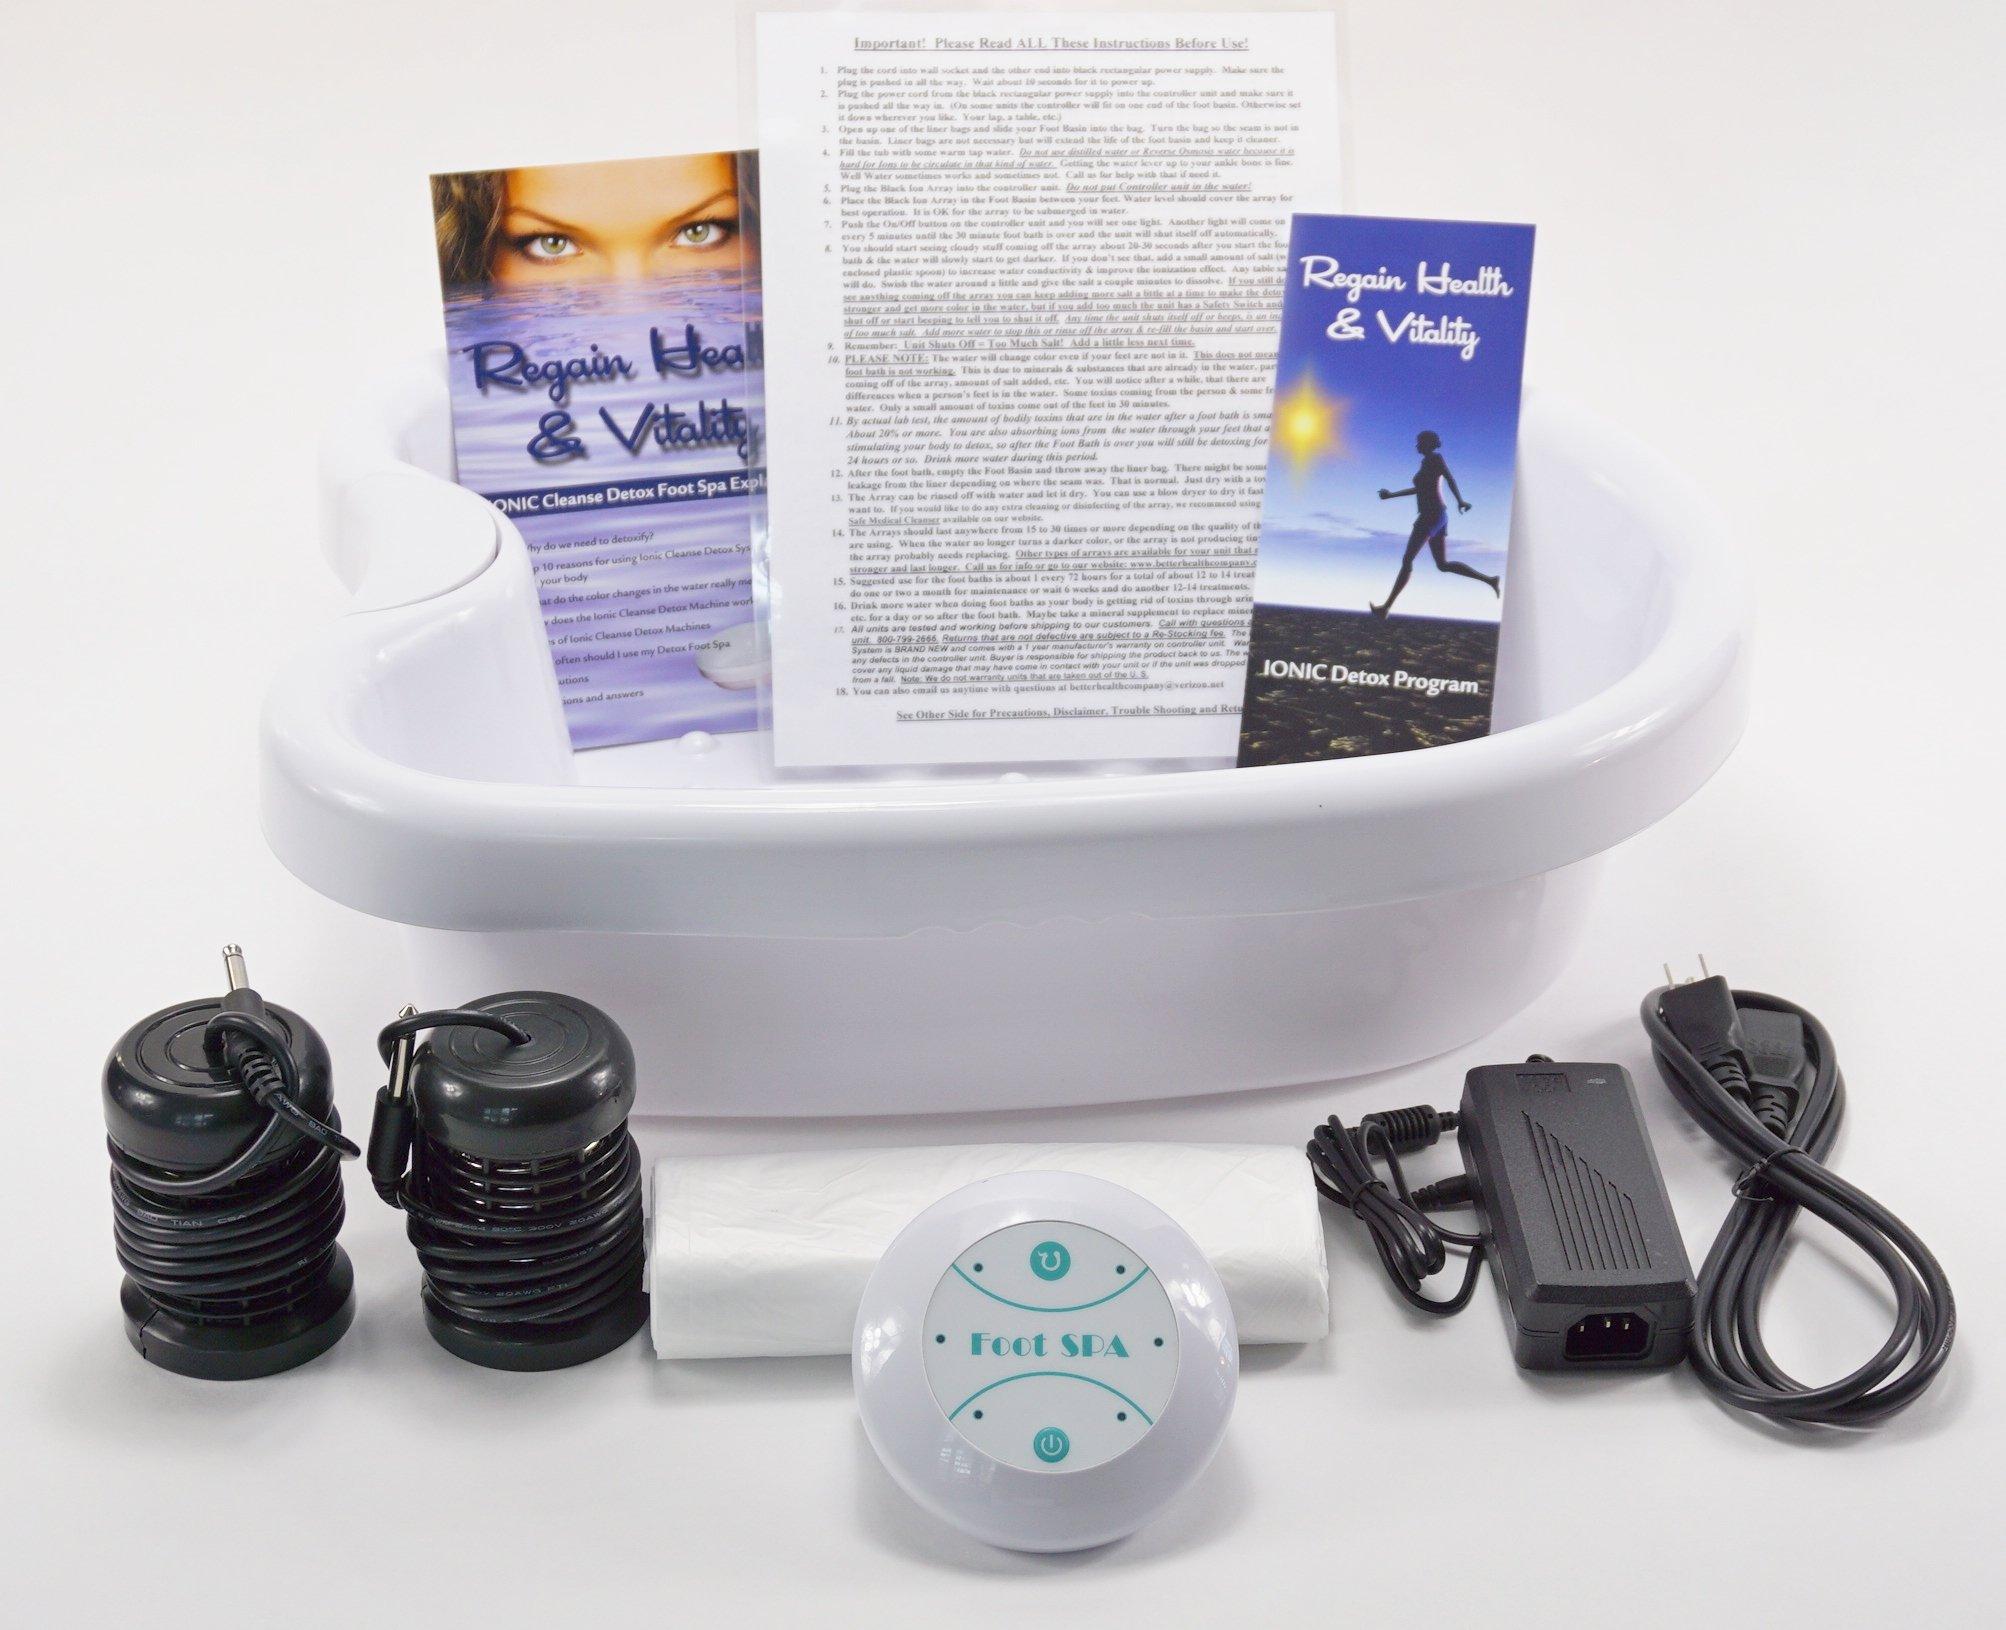 Ionic Cleanse Detox Foot Spa Bath. With Heavy Duty Acrylic Foot Basin. Top Seller